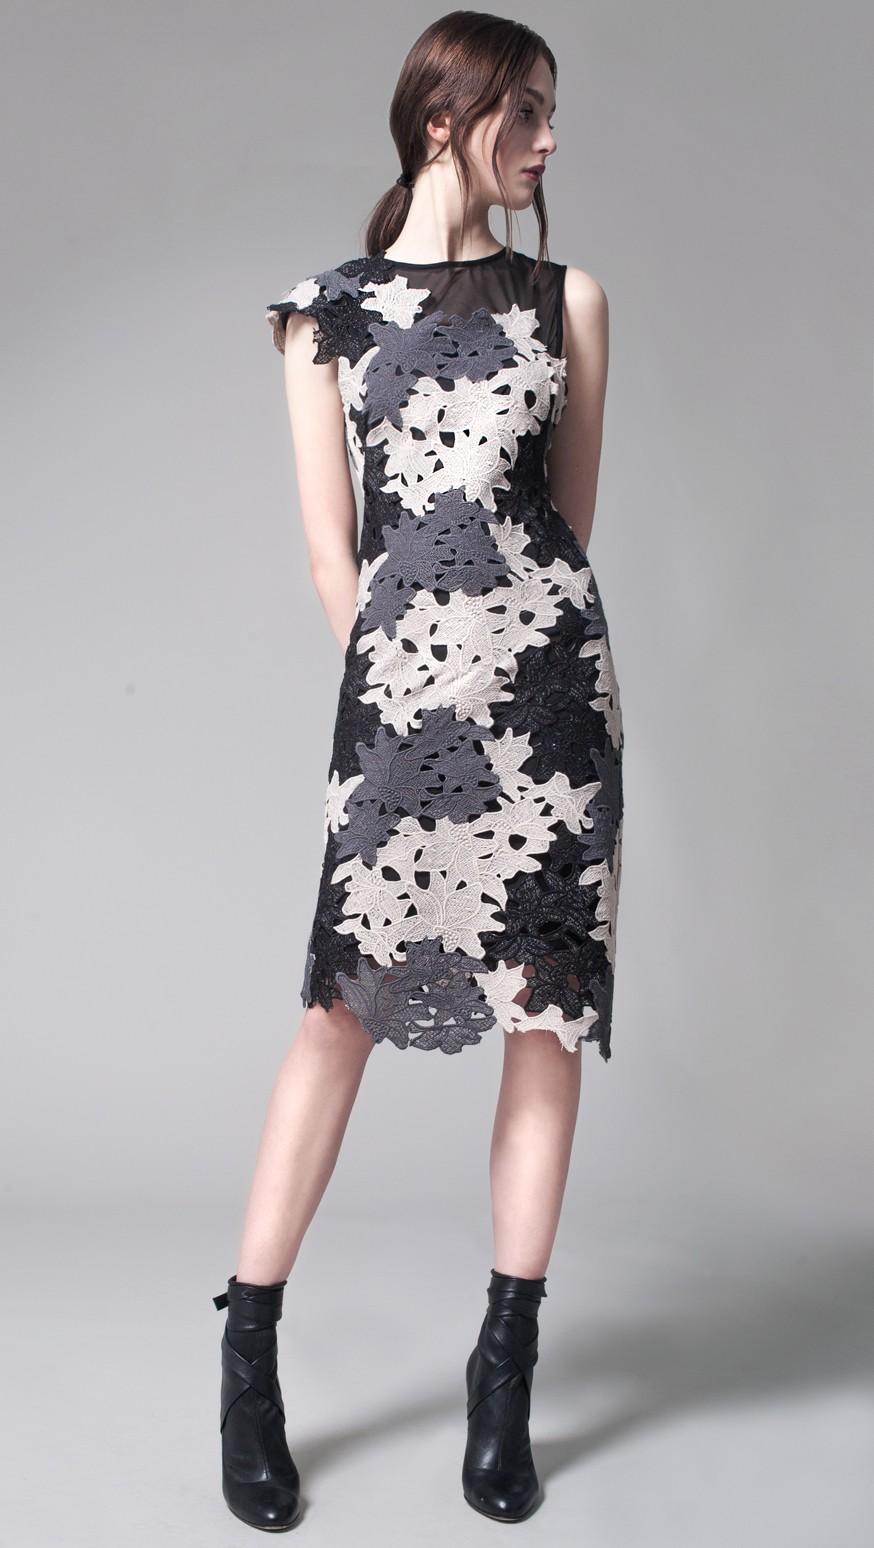 Ceres Lace One Shoulder Dress Black Multi Yoana Baraschi